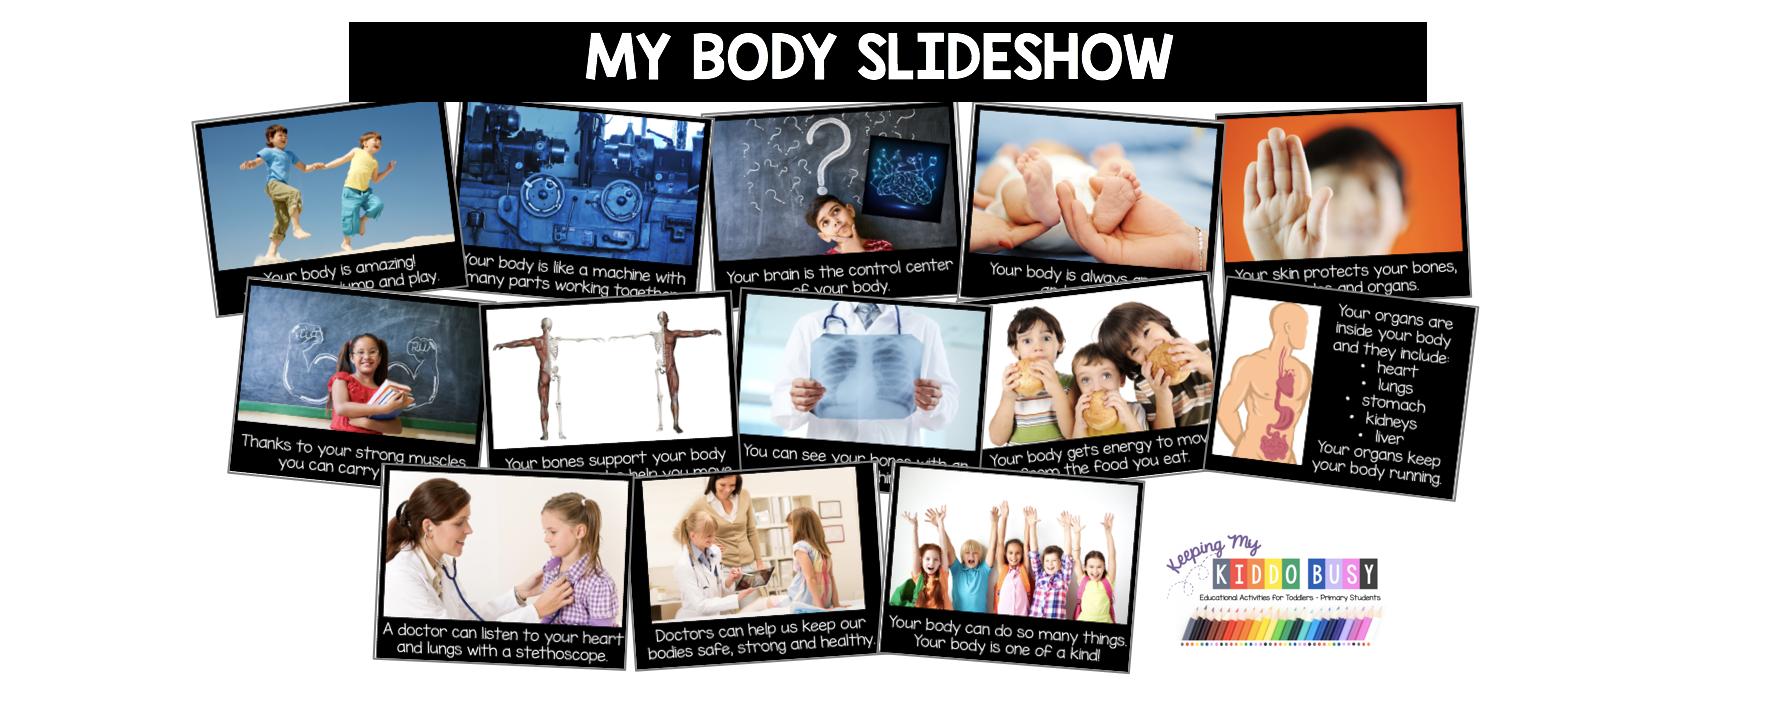 the human body slideshow